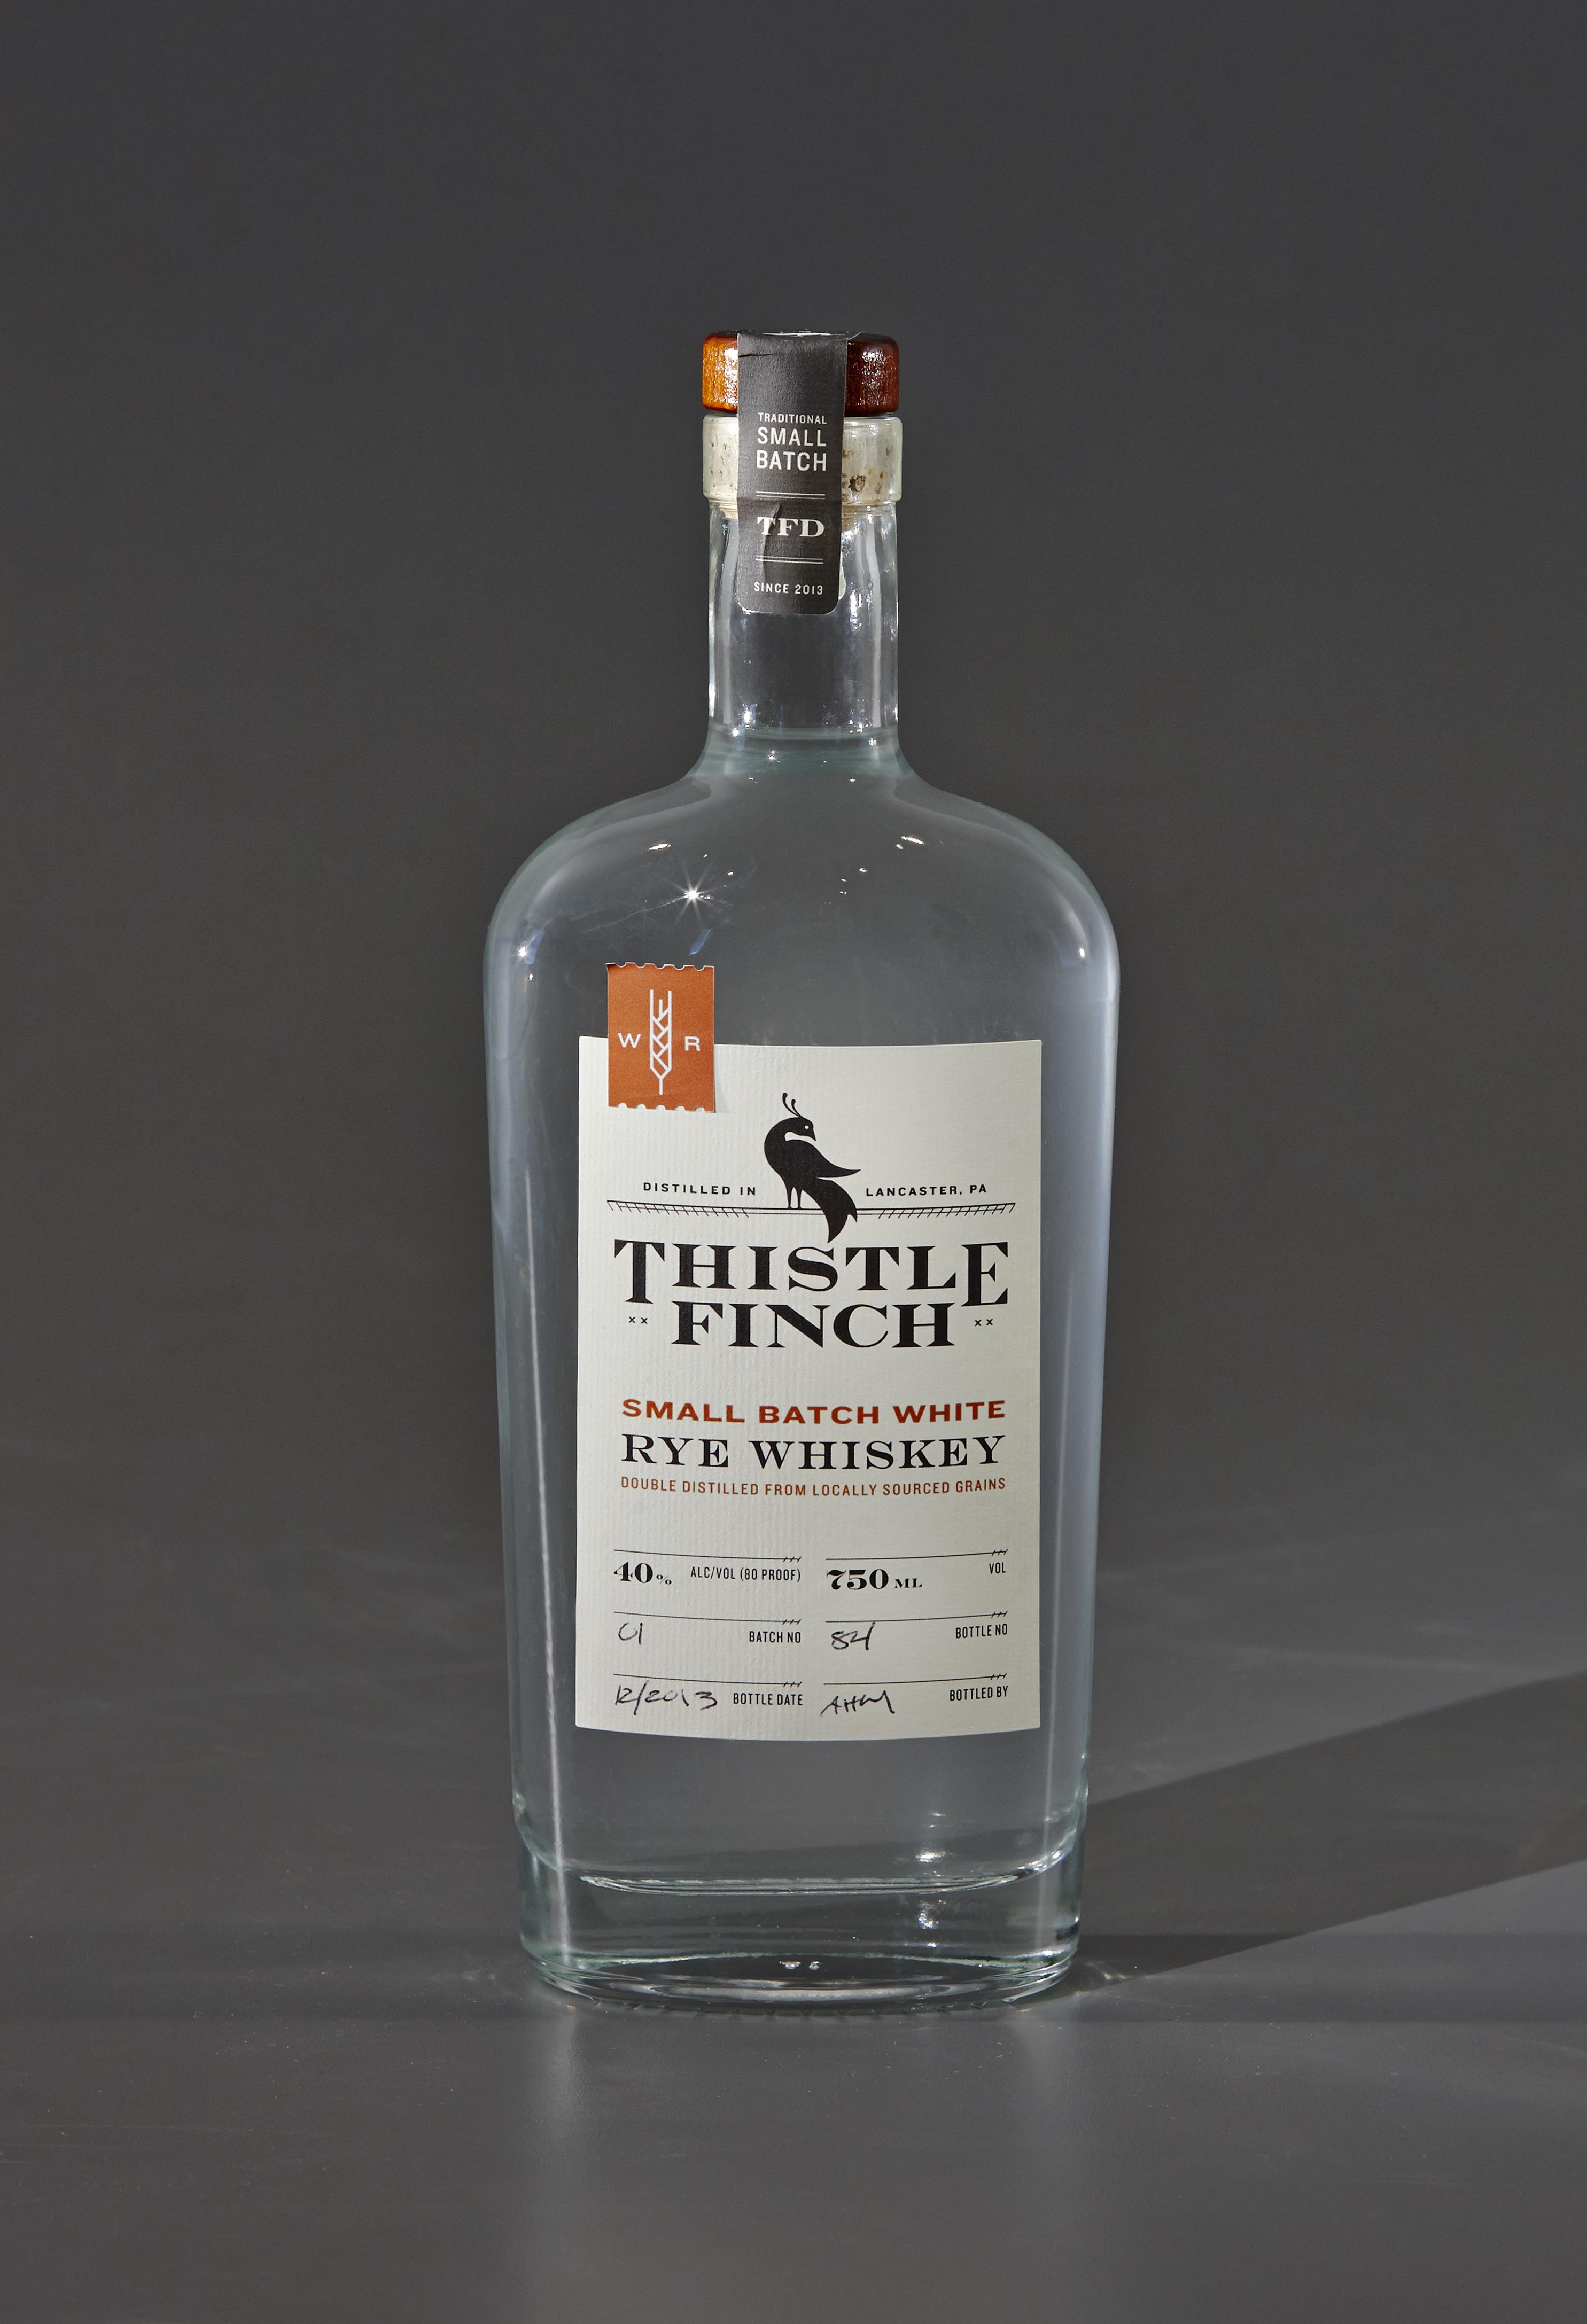 Thistle Finch Small Batch White Rye Whiskey